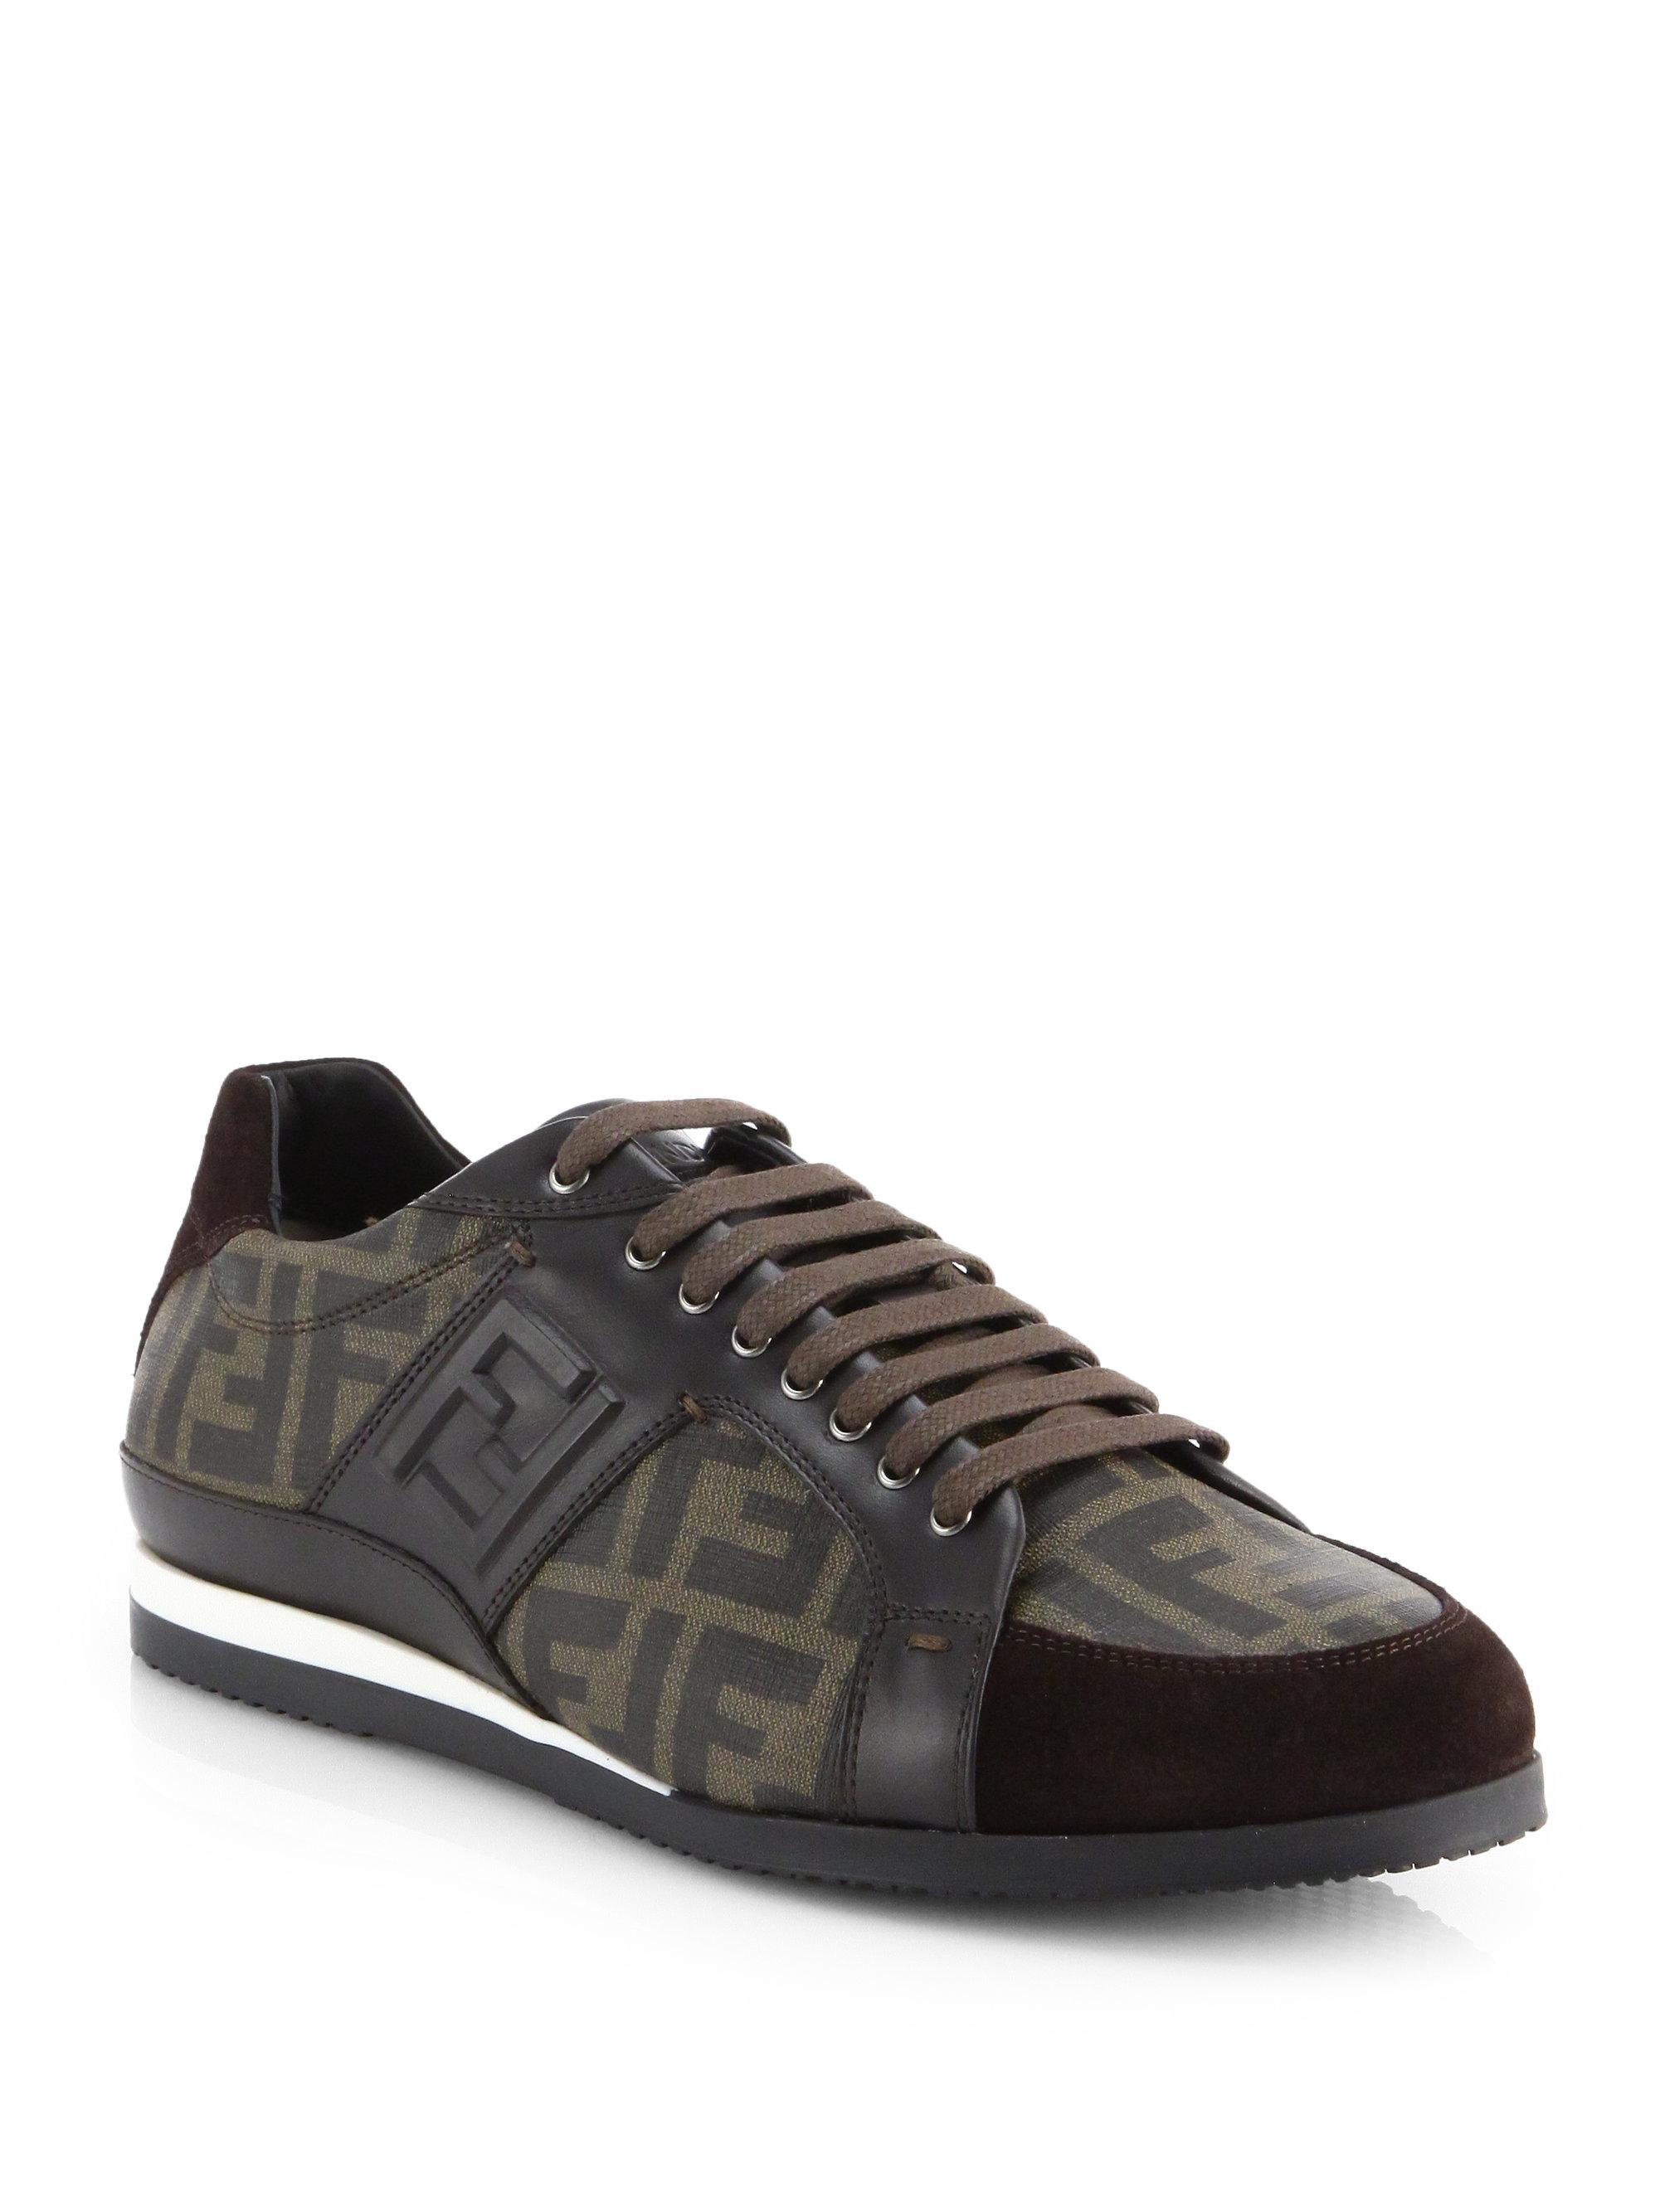 Fendi Zucca Shoes Men